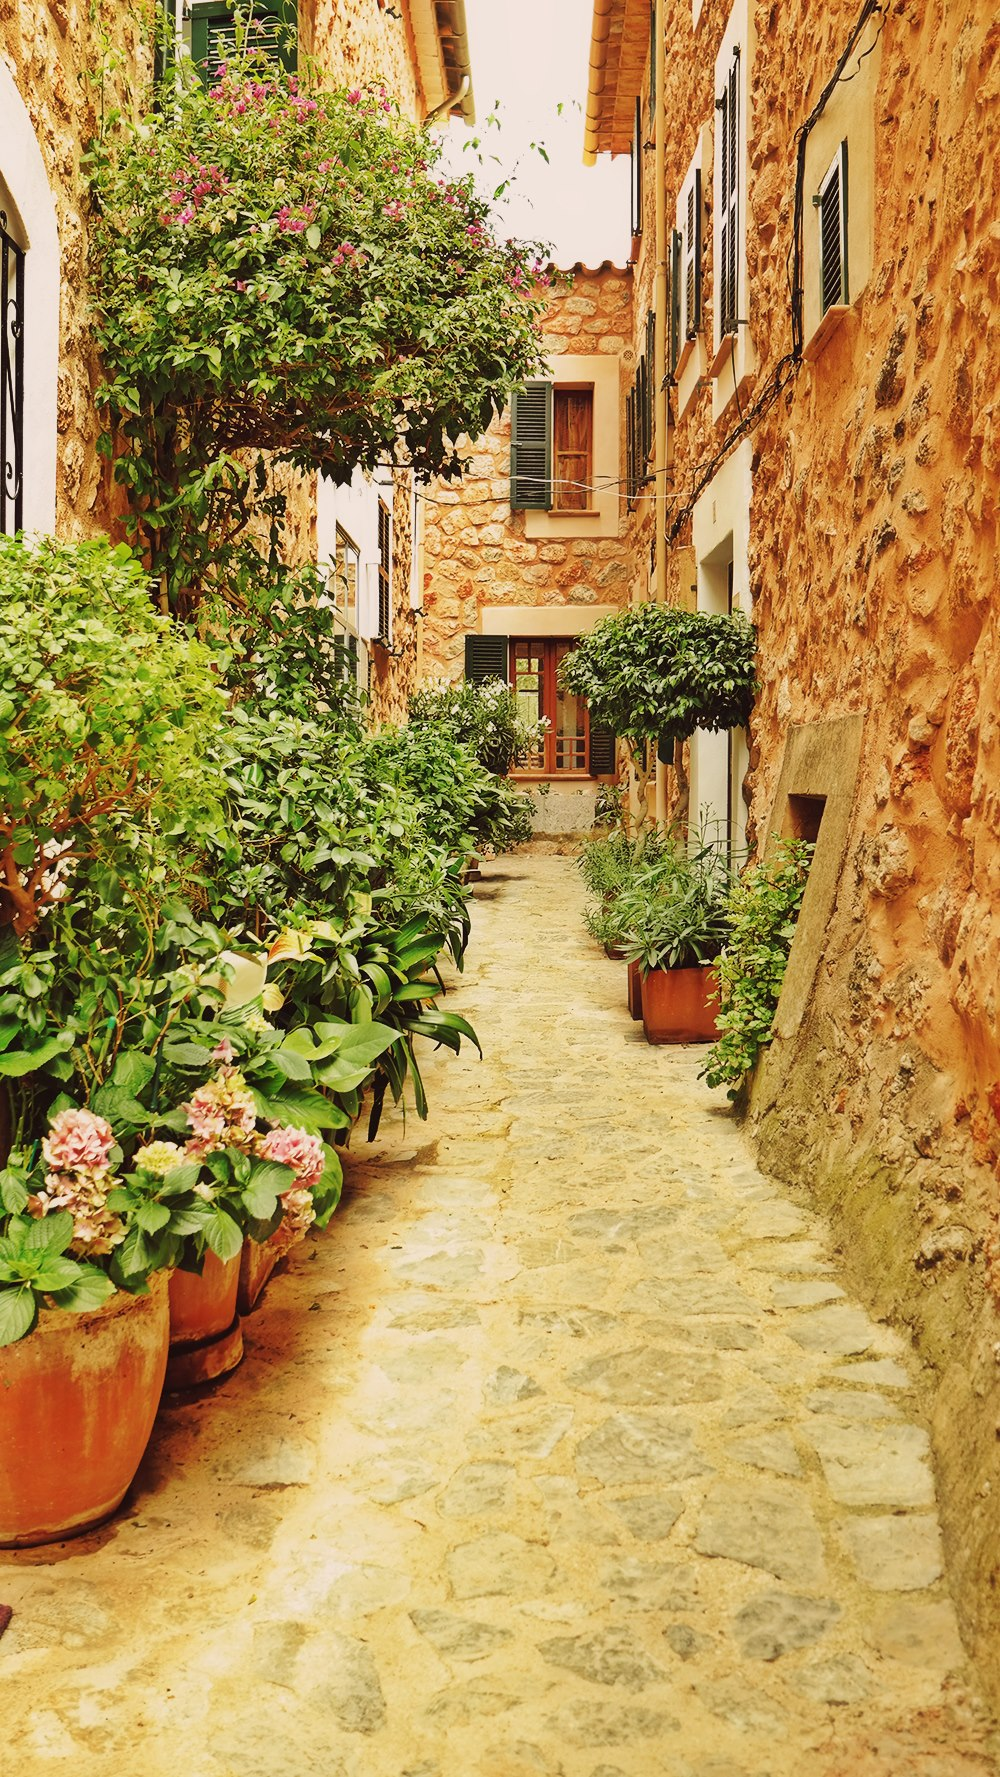 Mallorca-Fornalutx-Gasse-Hinterhof-Pflanzen